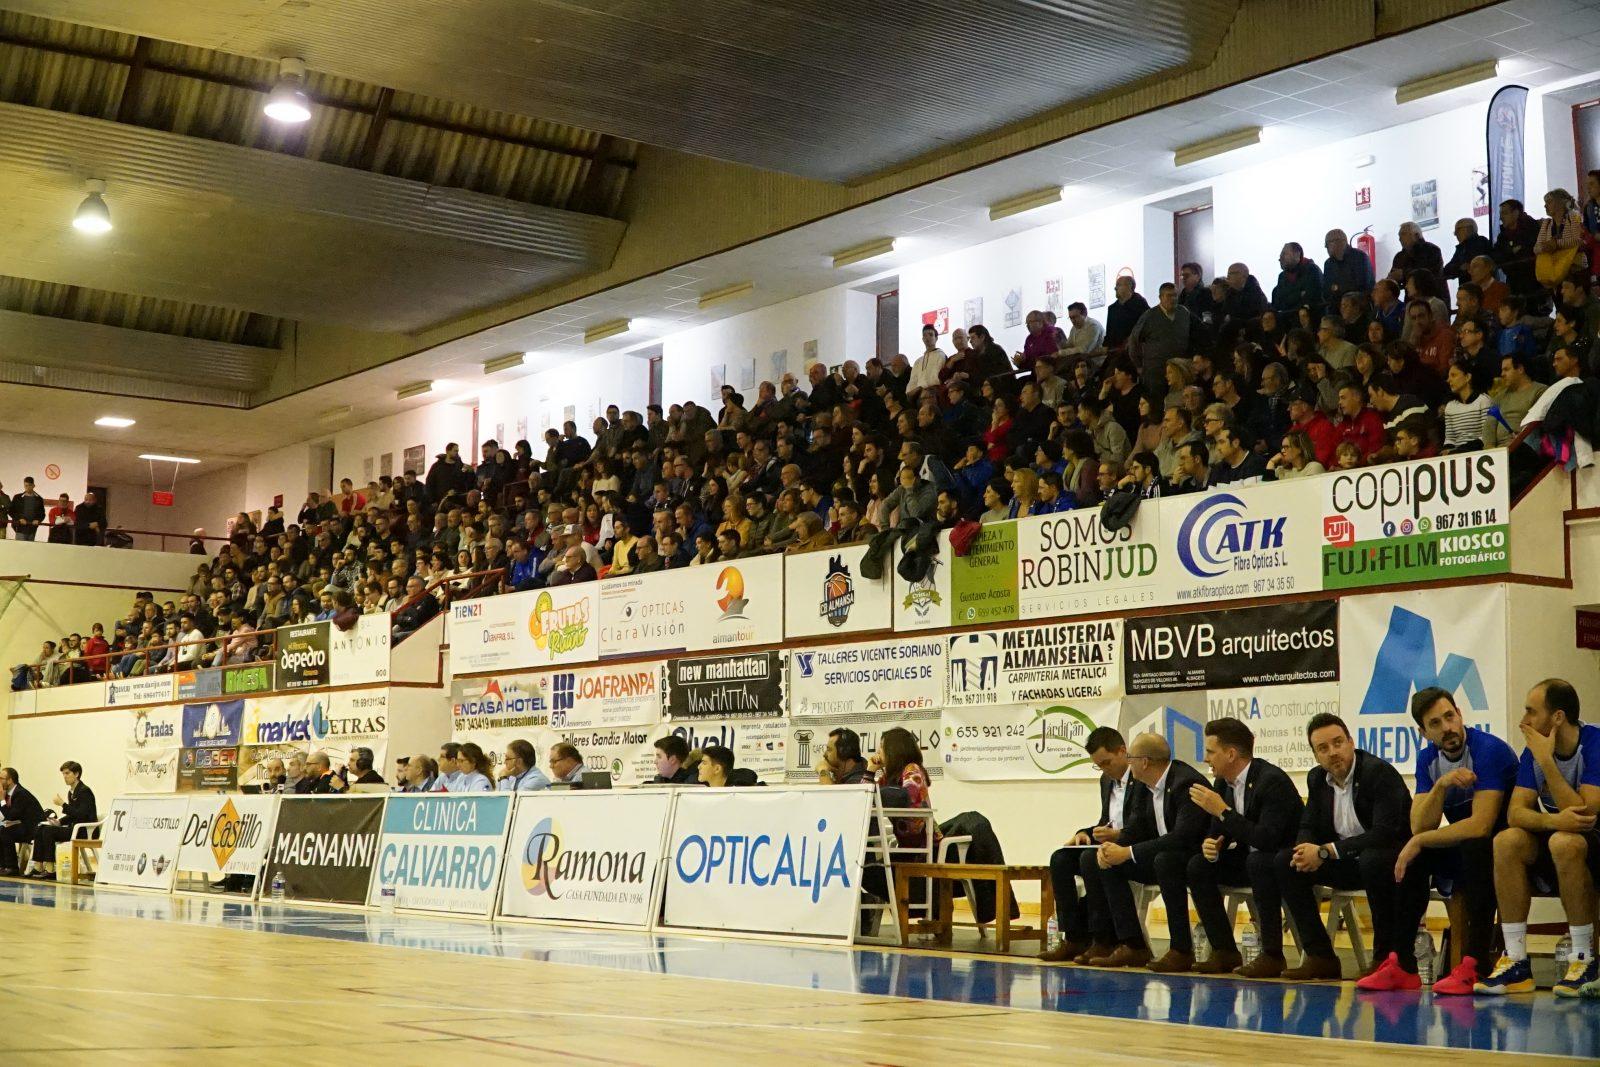 El CB Almansa podrá acoger público la próxima jornada